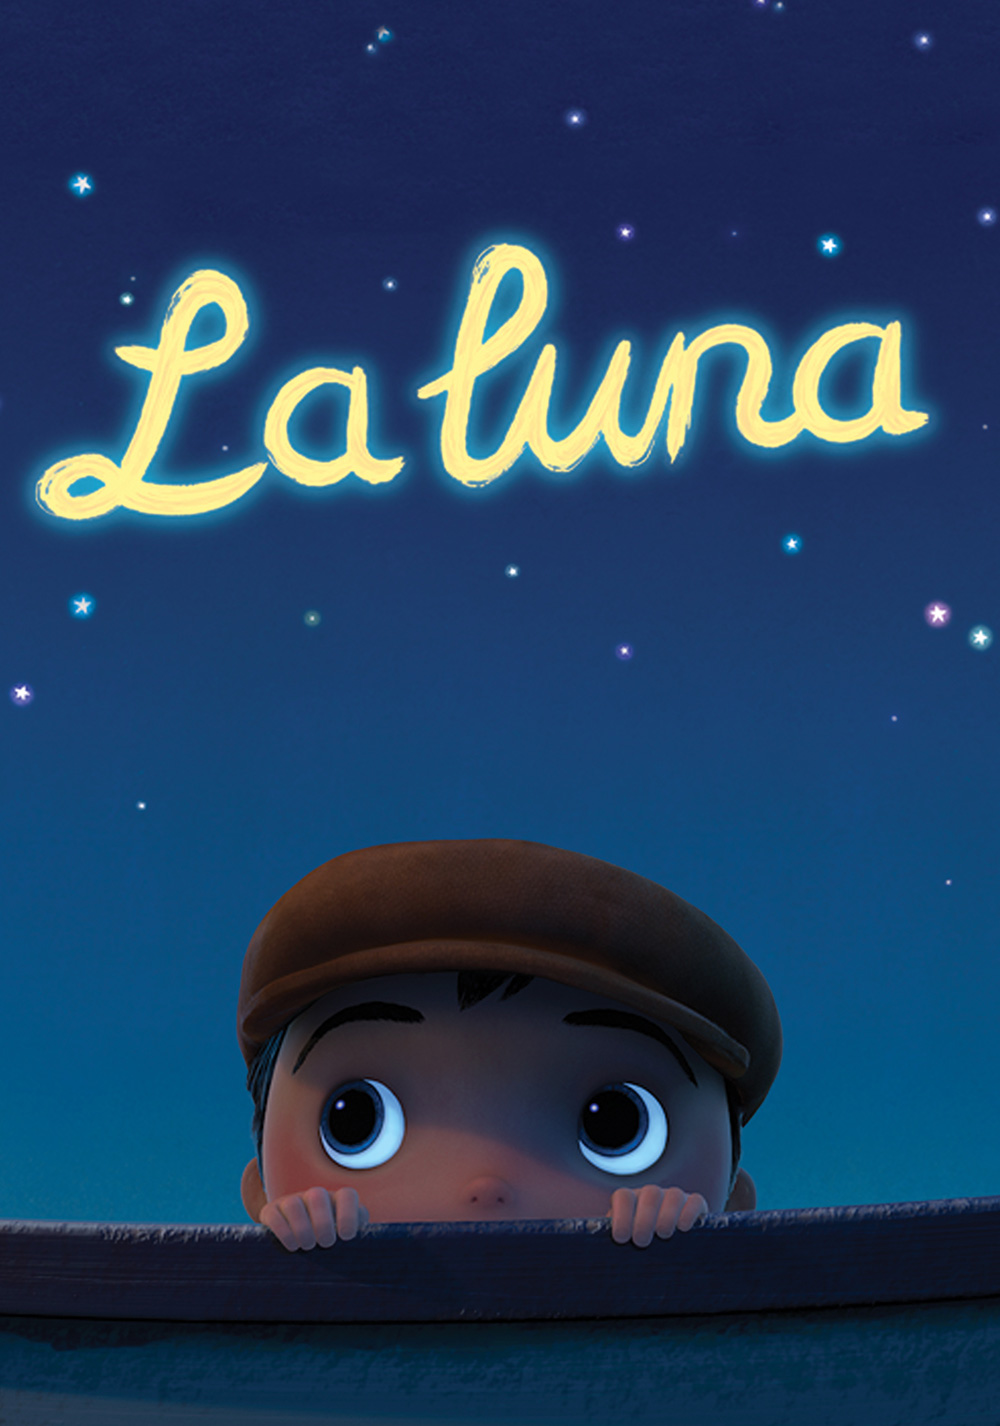 affiche poster luna disney pixar